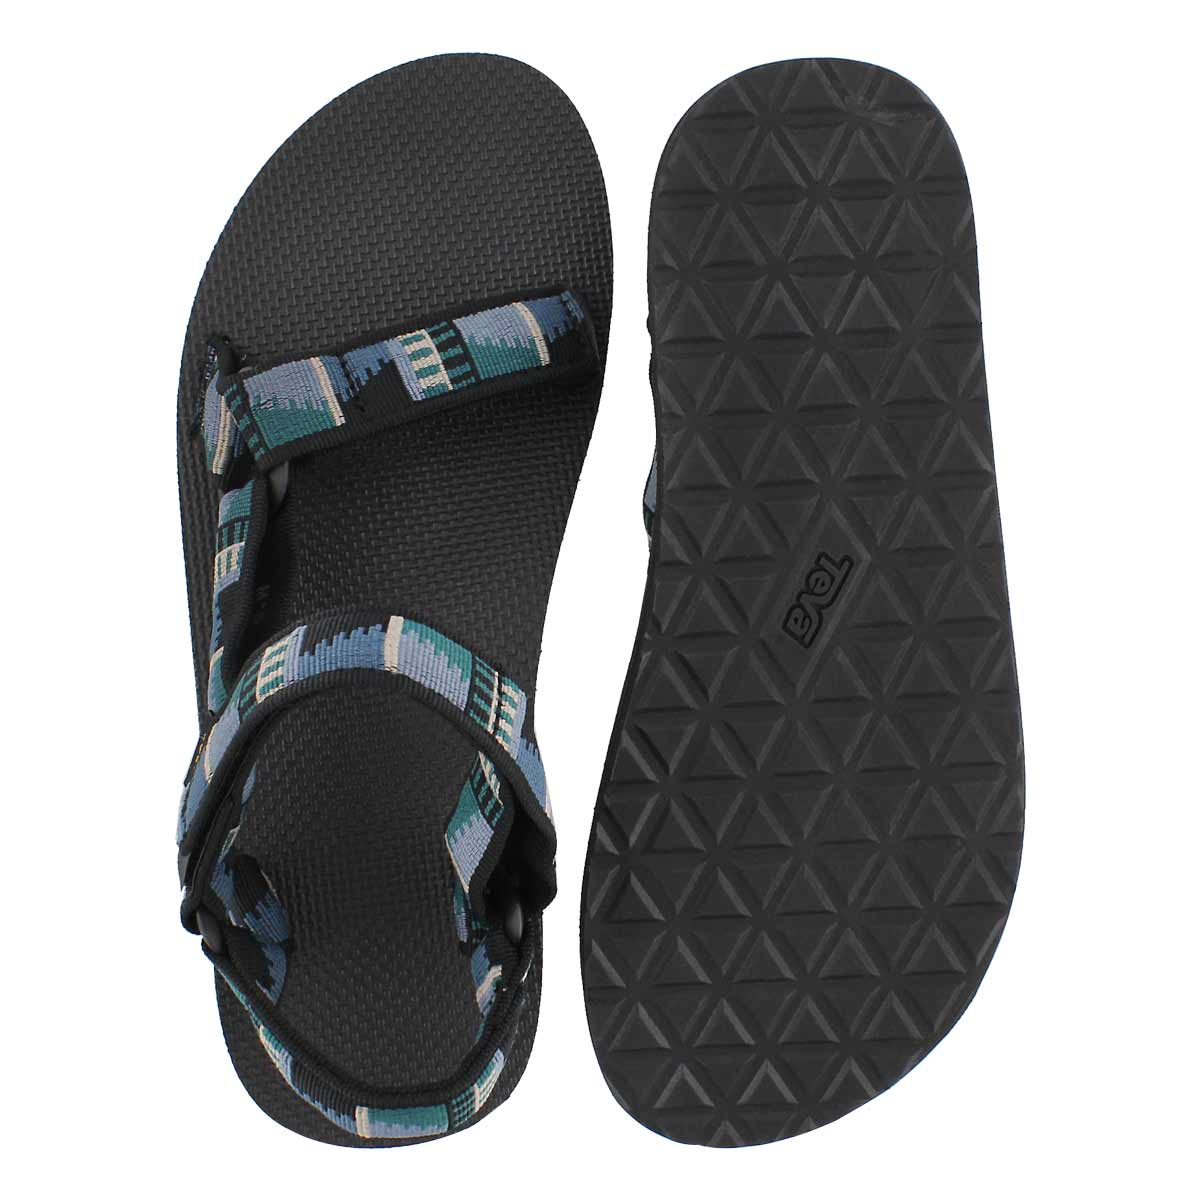 Mns Original Universal peaks blk sandal